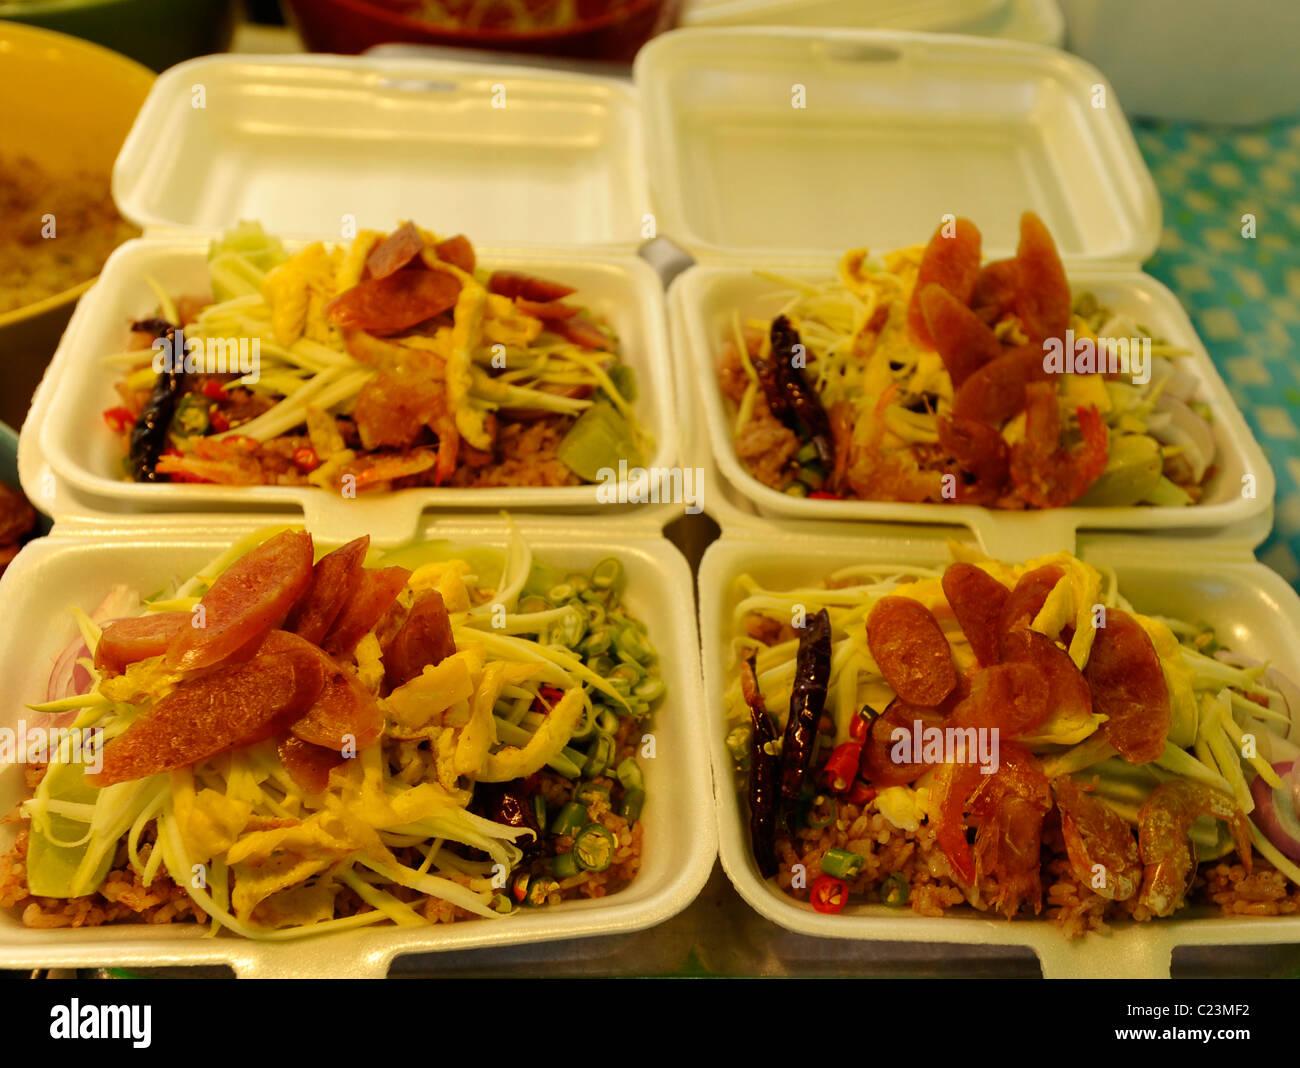 Indian Fast Food Restaurants In Los Angeles